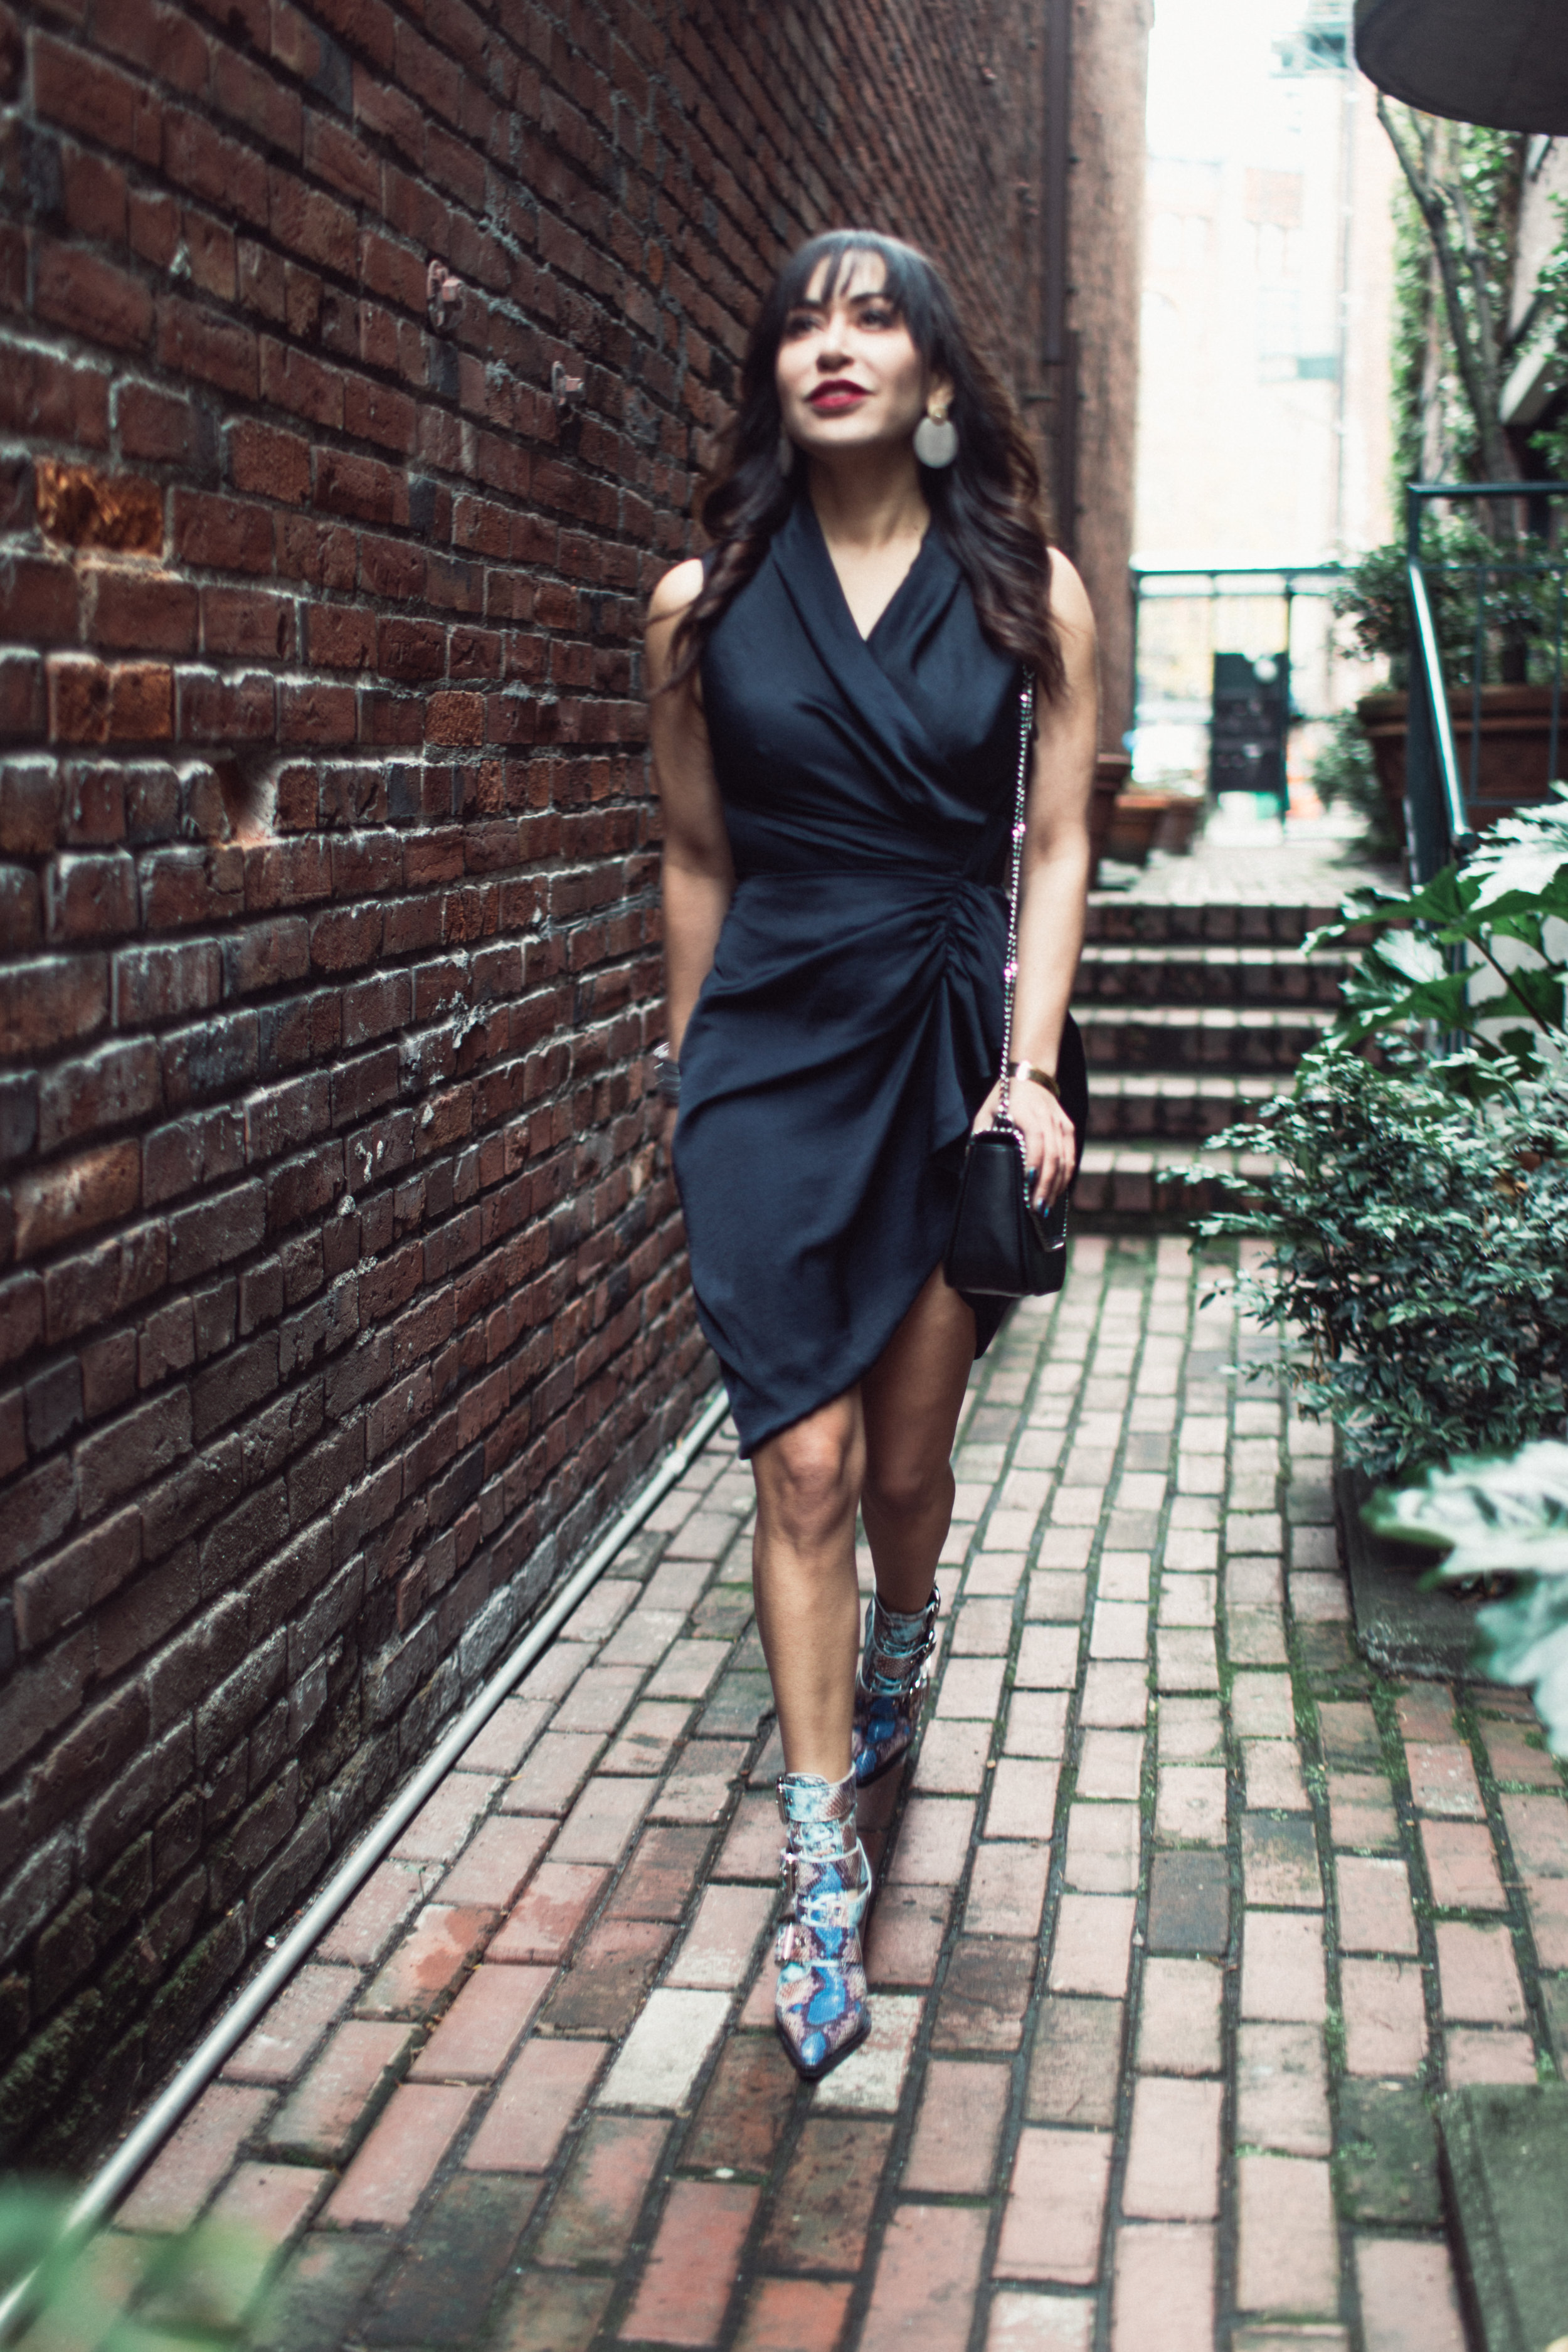 Chamonix Films - Poplin Style - Ashley (Dec 2018)-134.jpg